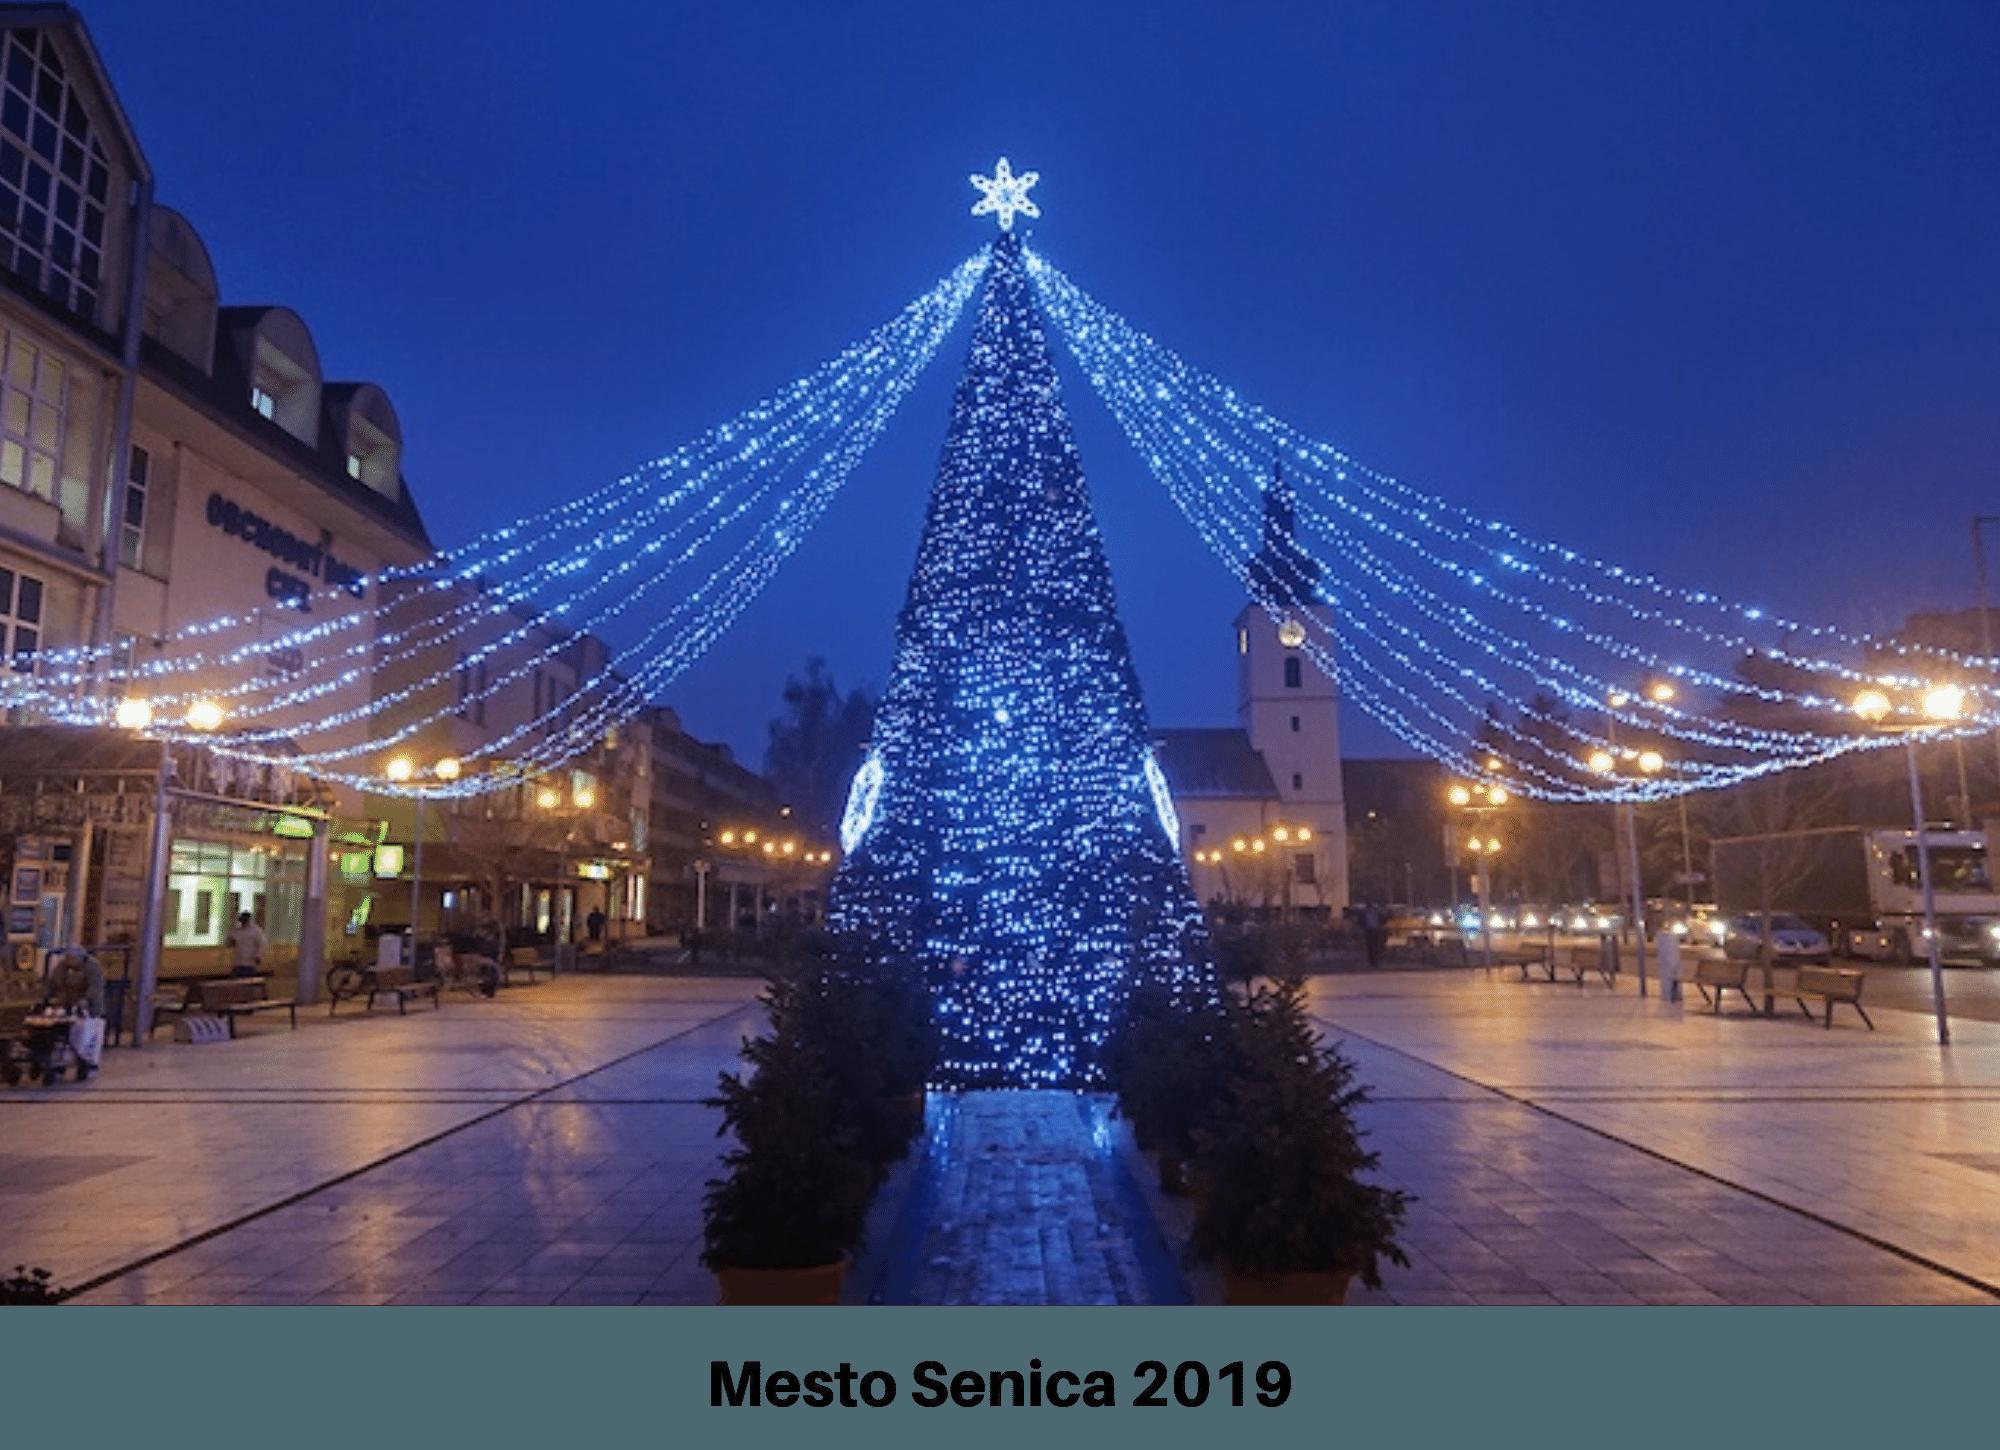 Mesto Senica 2019